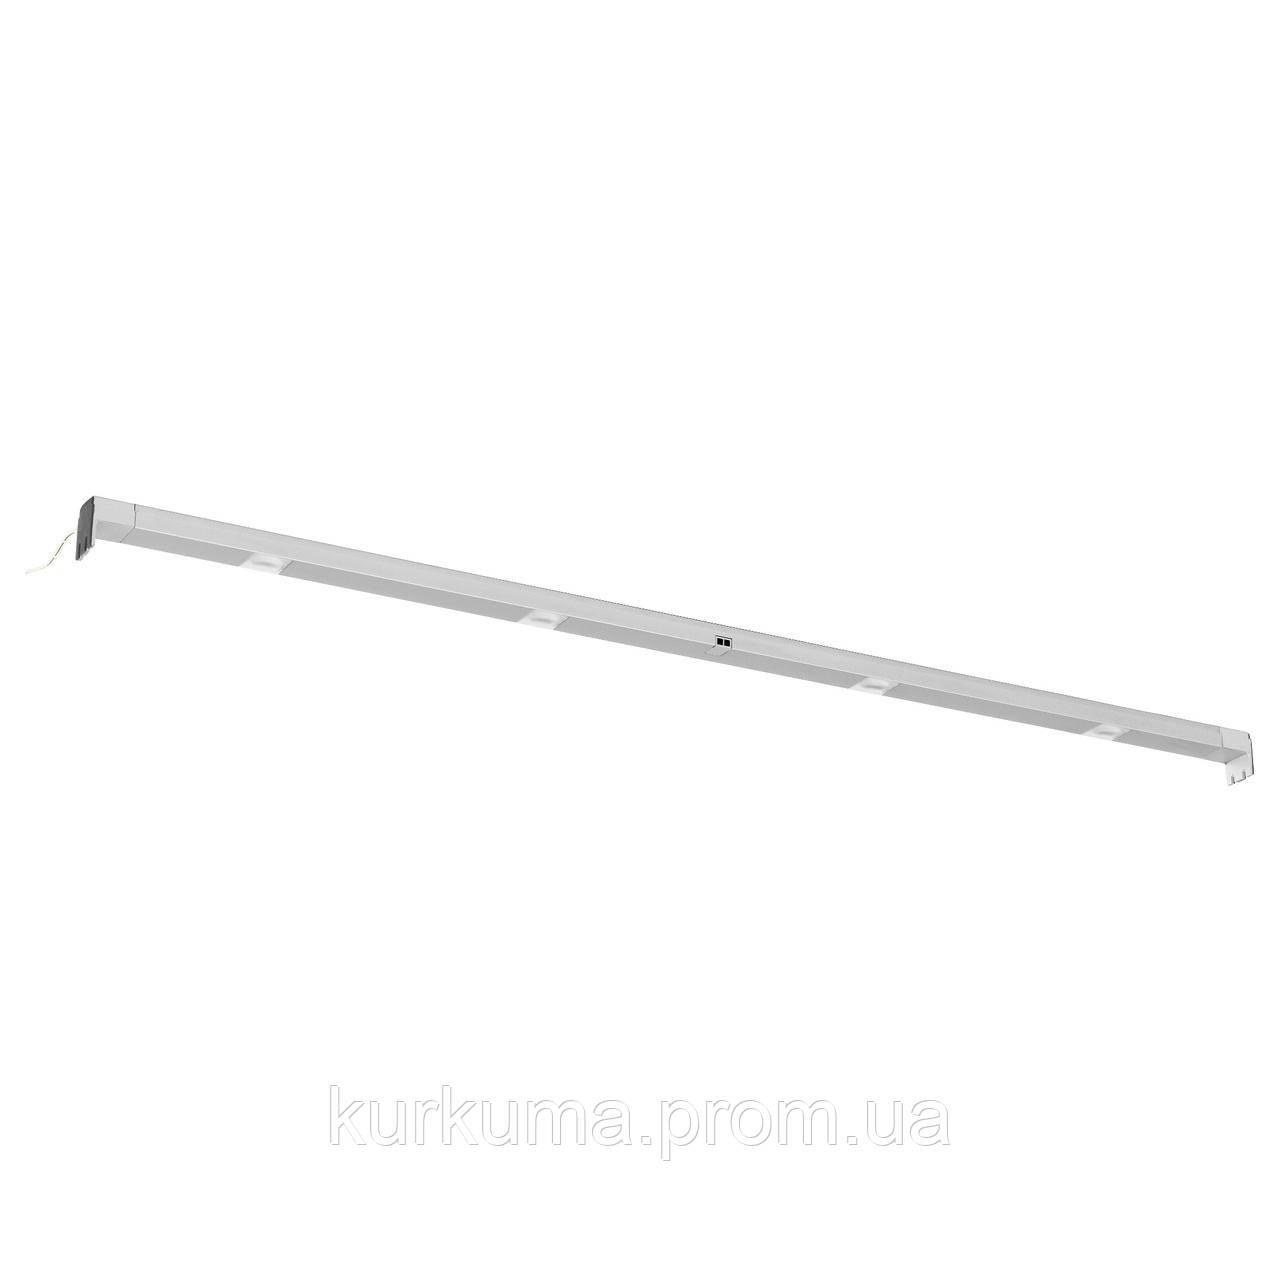 IKEA OMLOPP Светодиодная подсветка, серебро  (802.452.30)